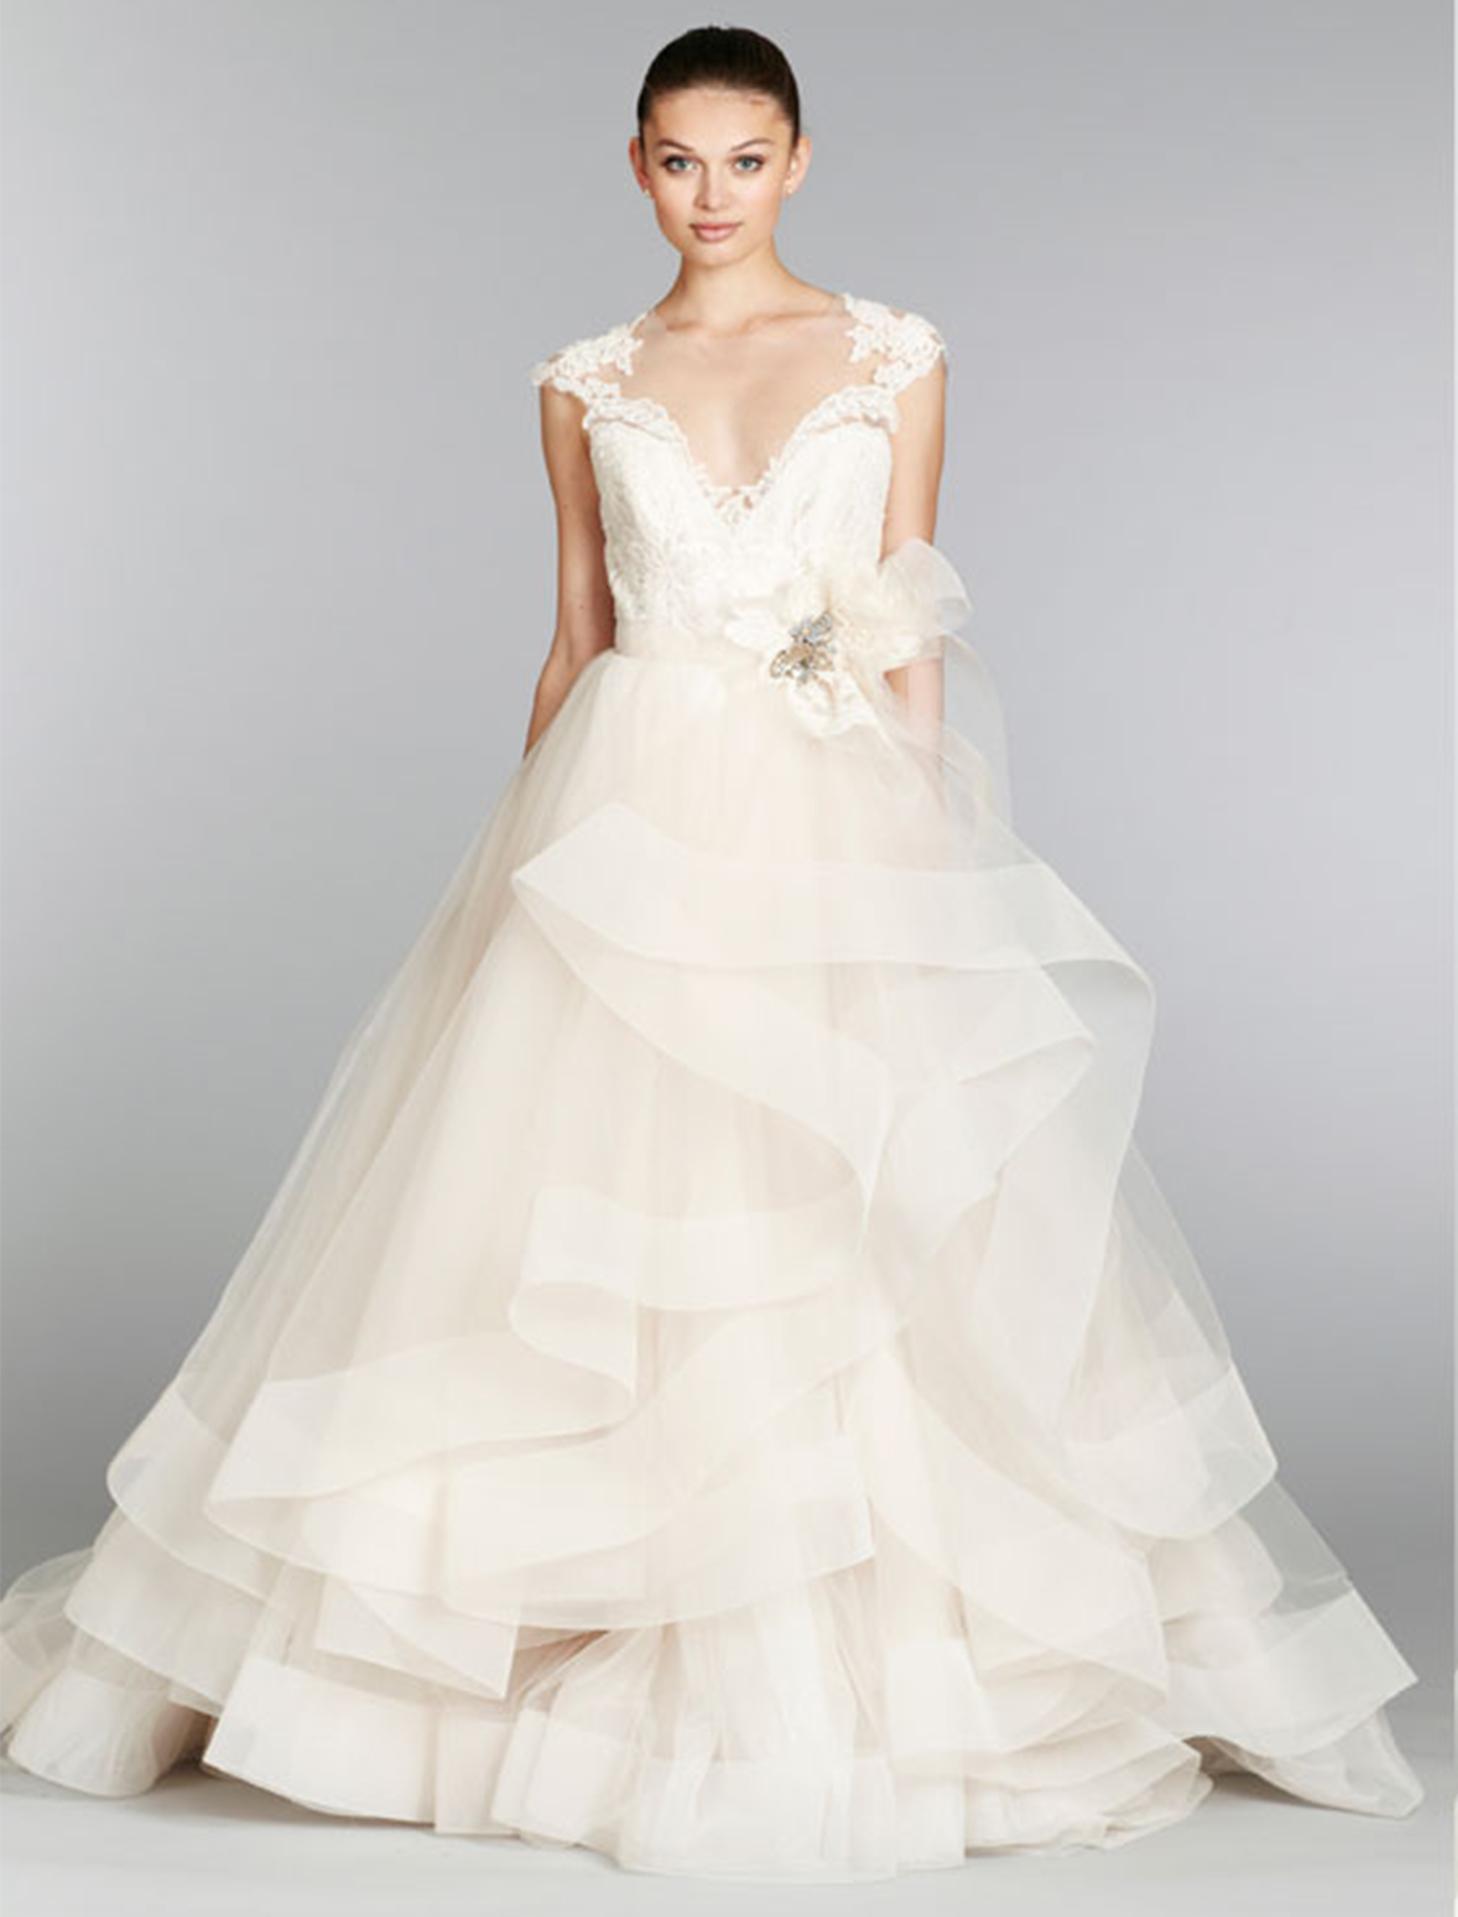 Ball gown wedding dress kleinfeld bridal for Kleinfeld wedding dresses sale